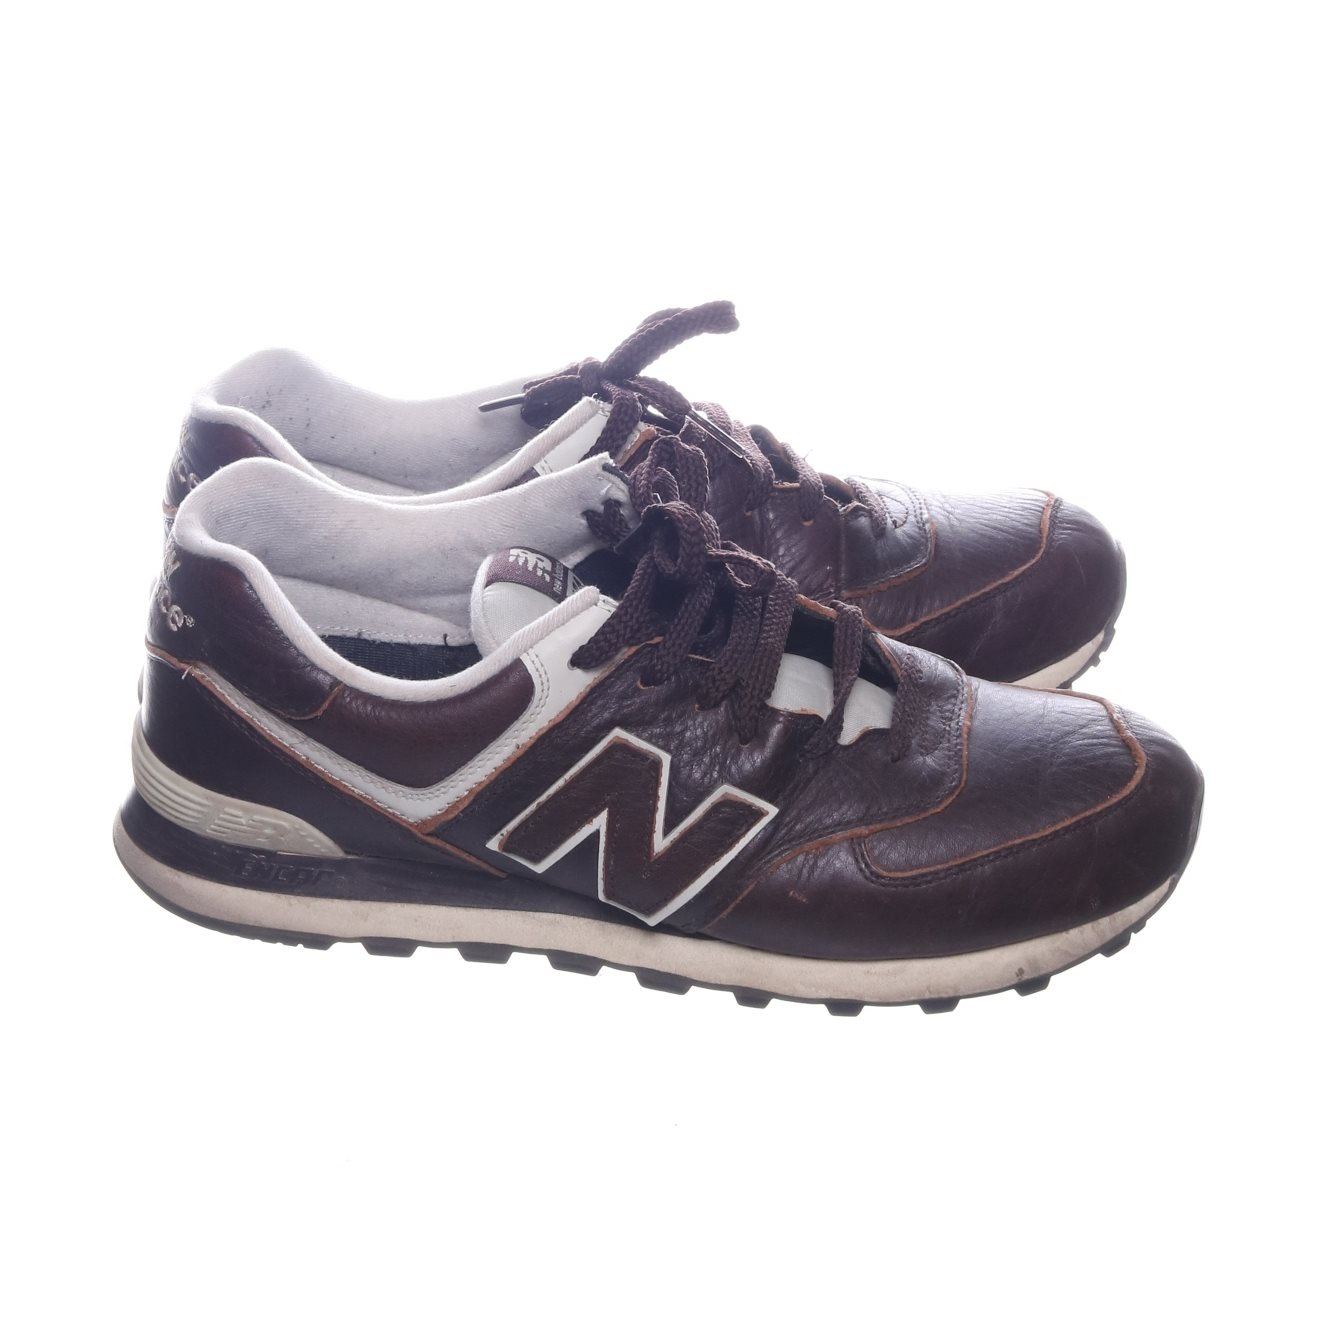 size 40 47500 26861 New Balance, Sneakers, Strl: 44, ML574LUA, Brun